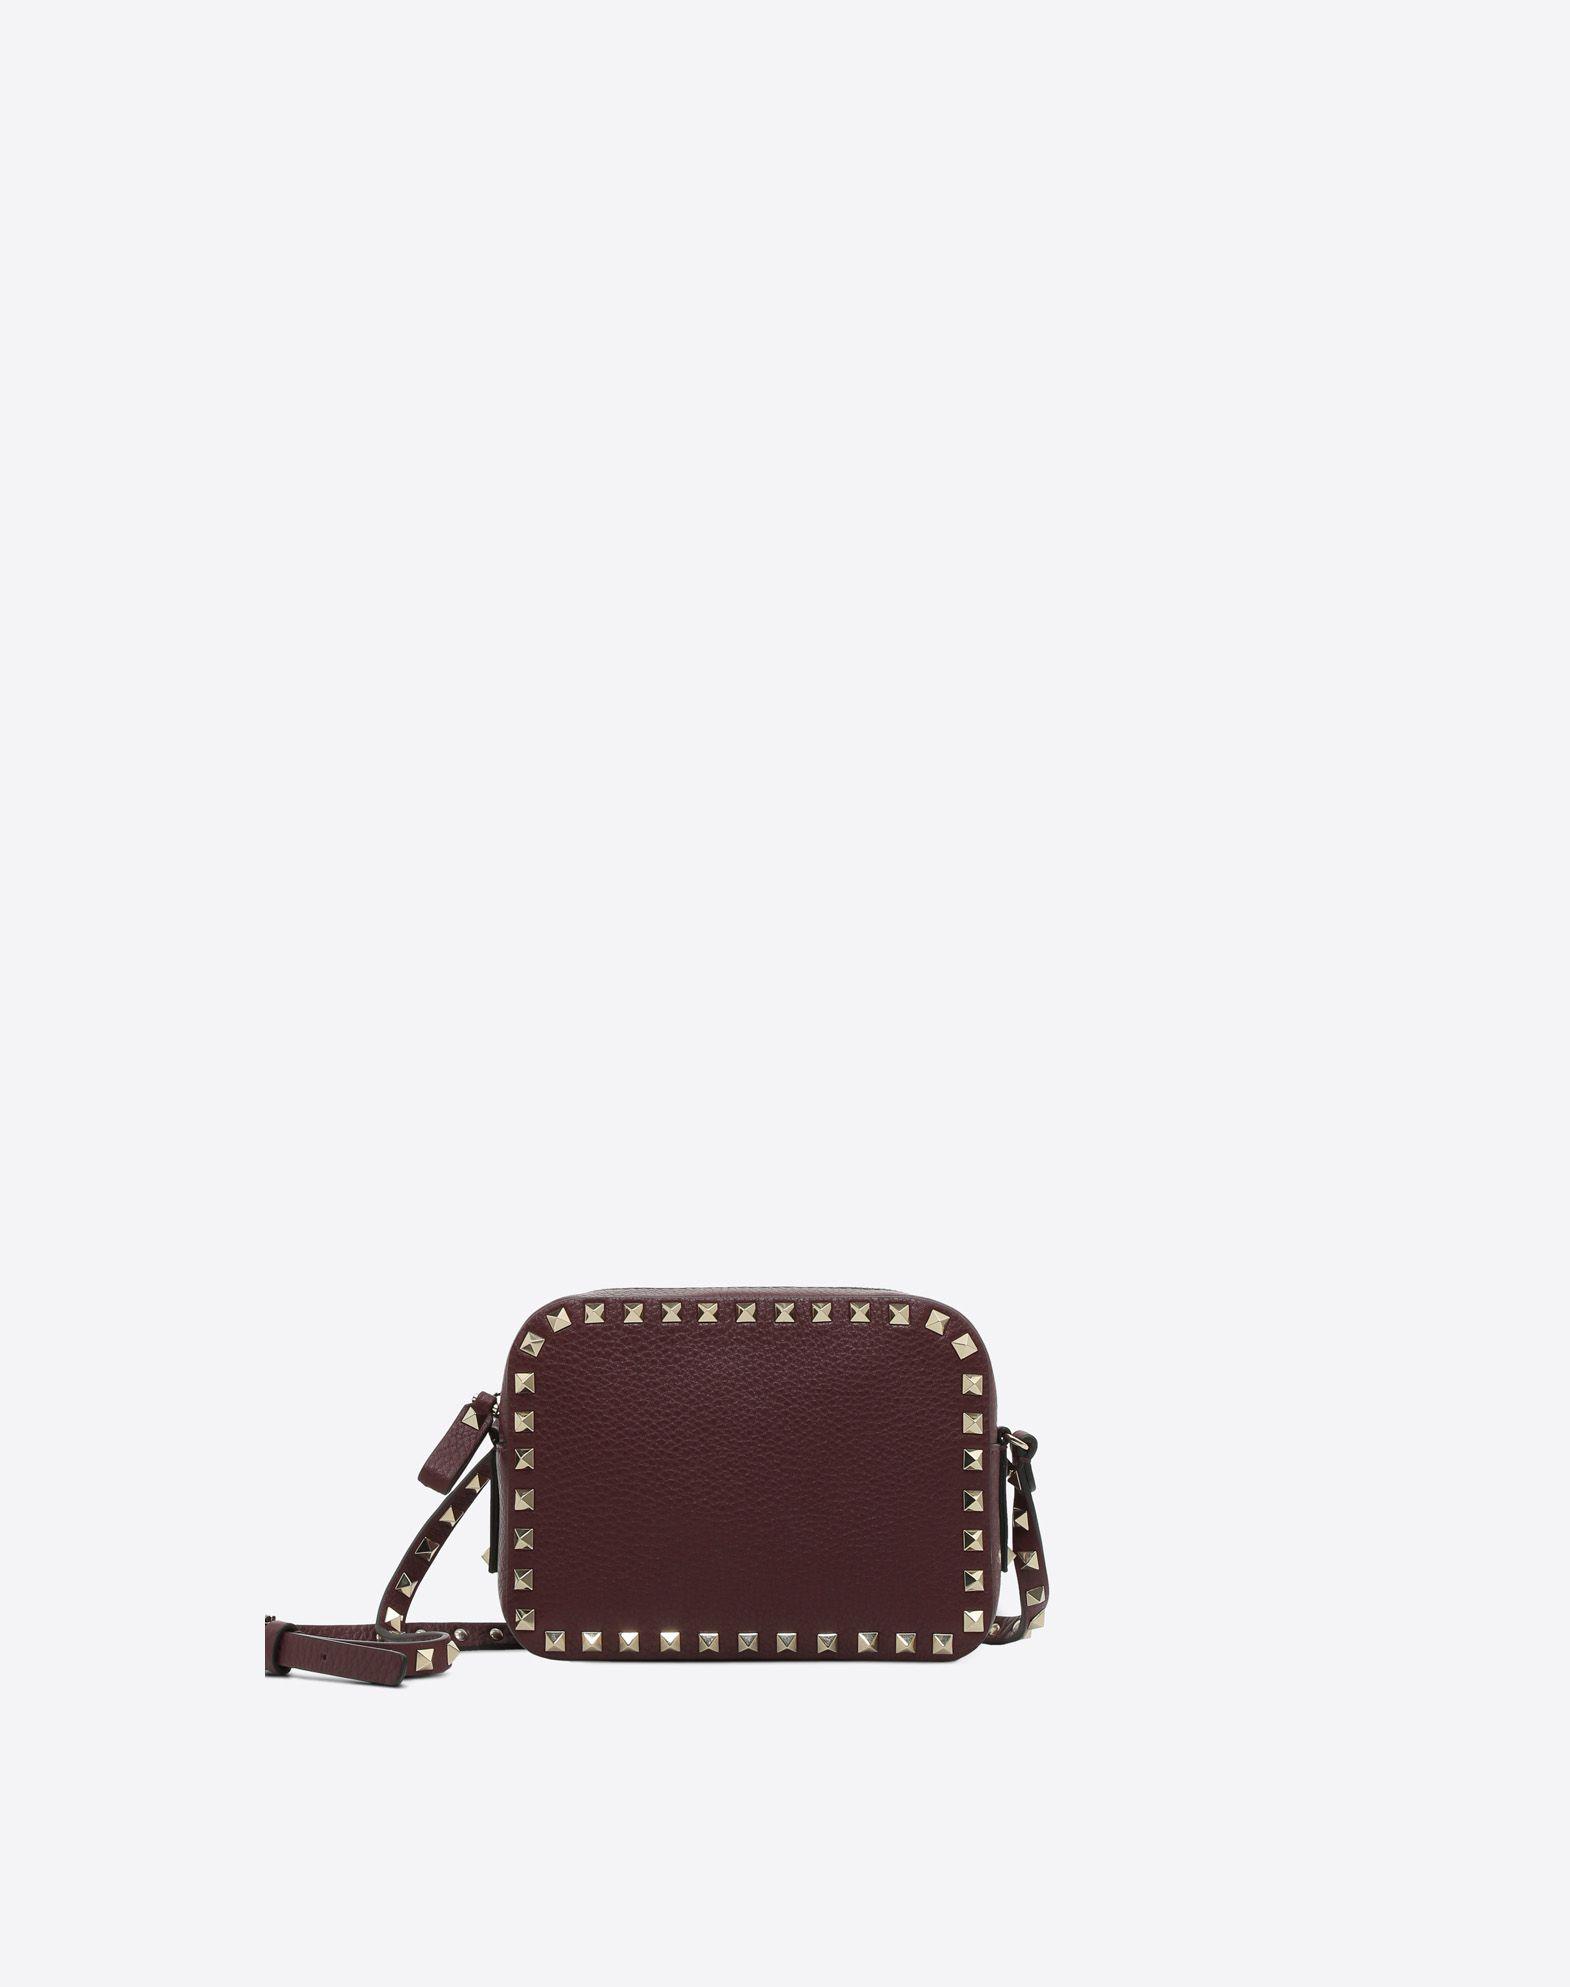 VALENTINO Studded Textured leather Logo Solid colour Zip Internal pocket Adjustable shoulder straps Messenger bags  45382335xe